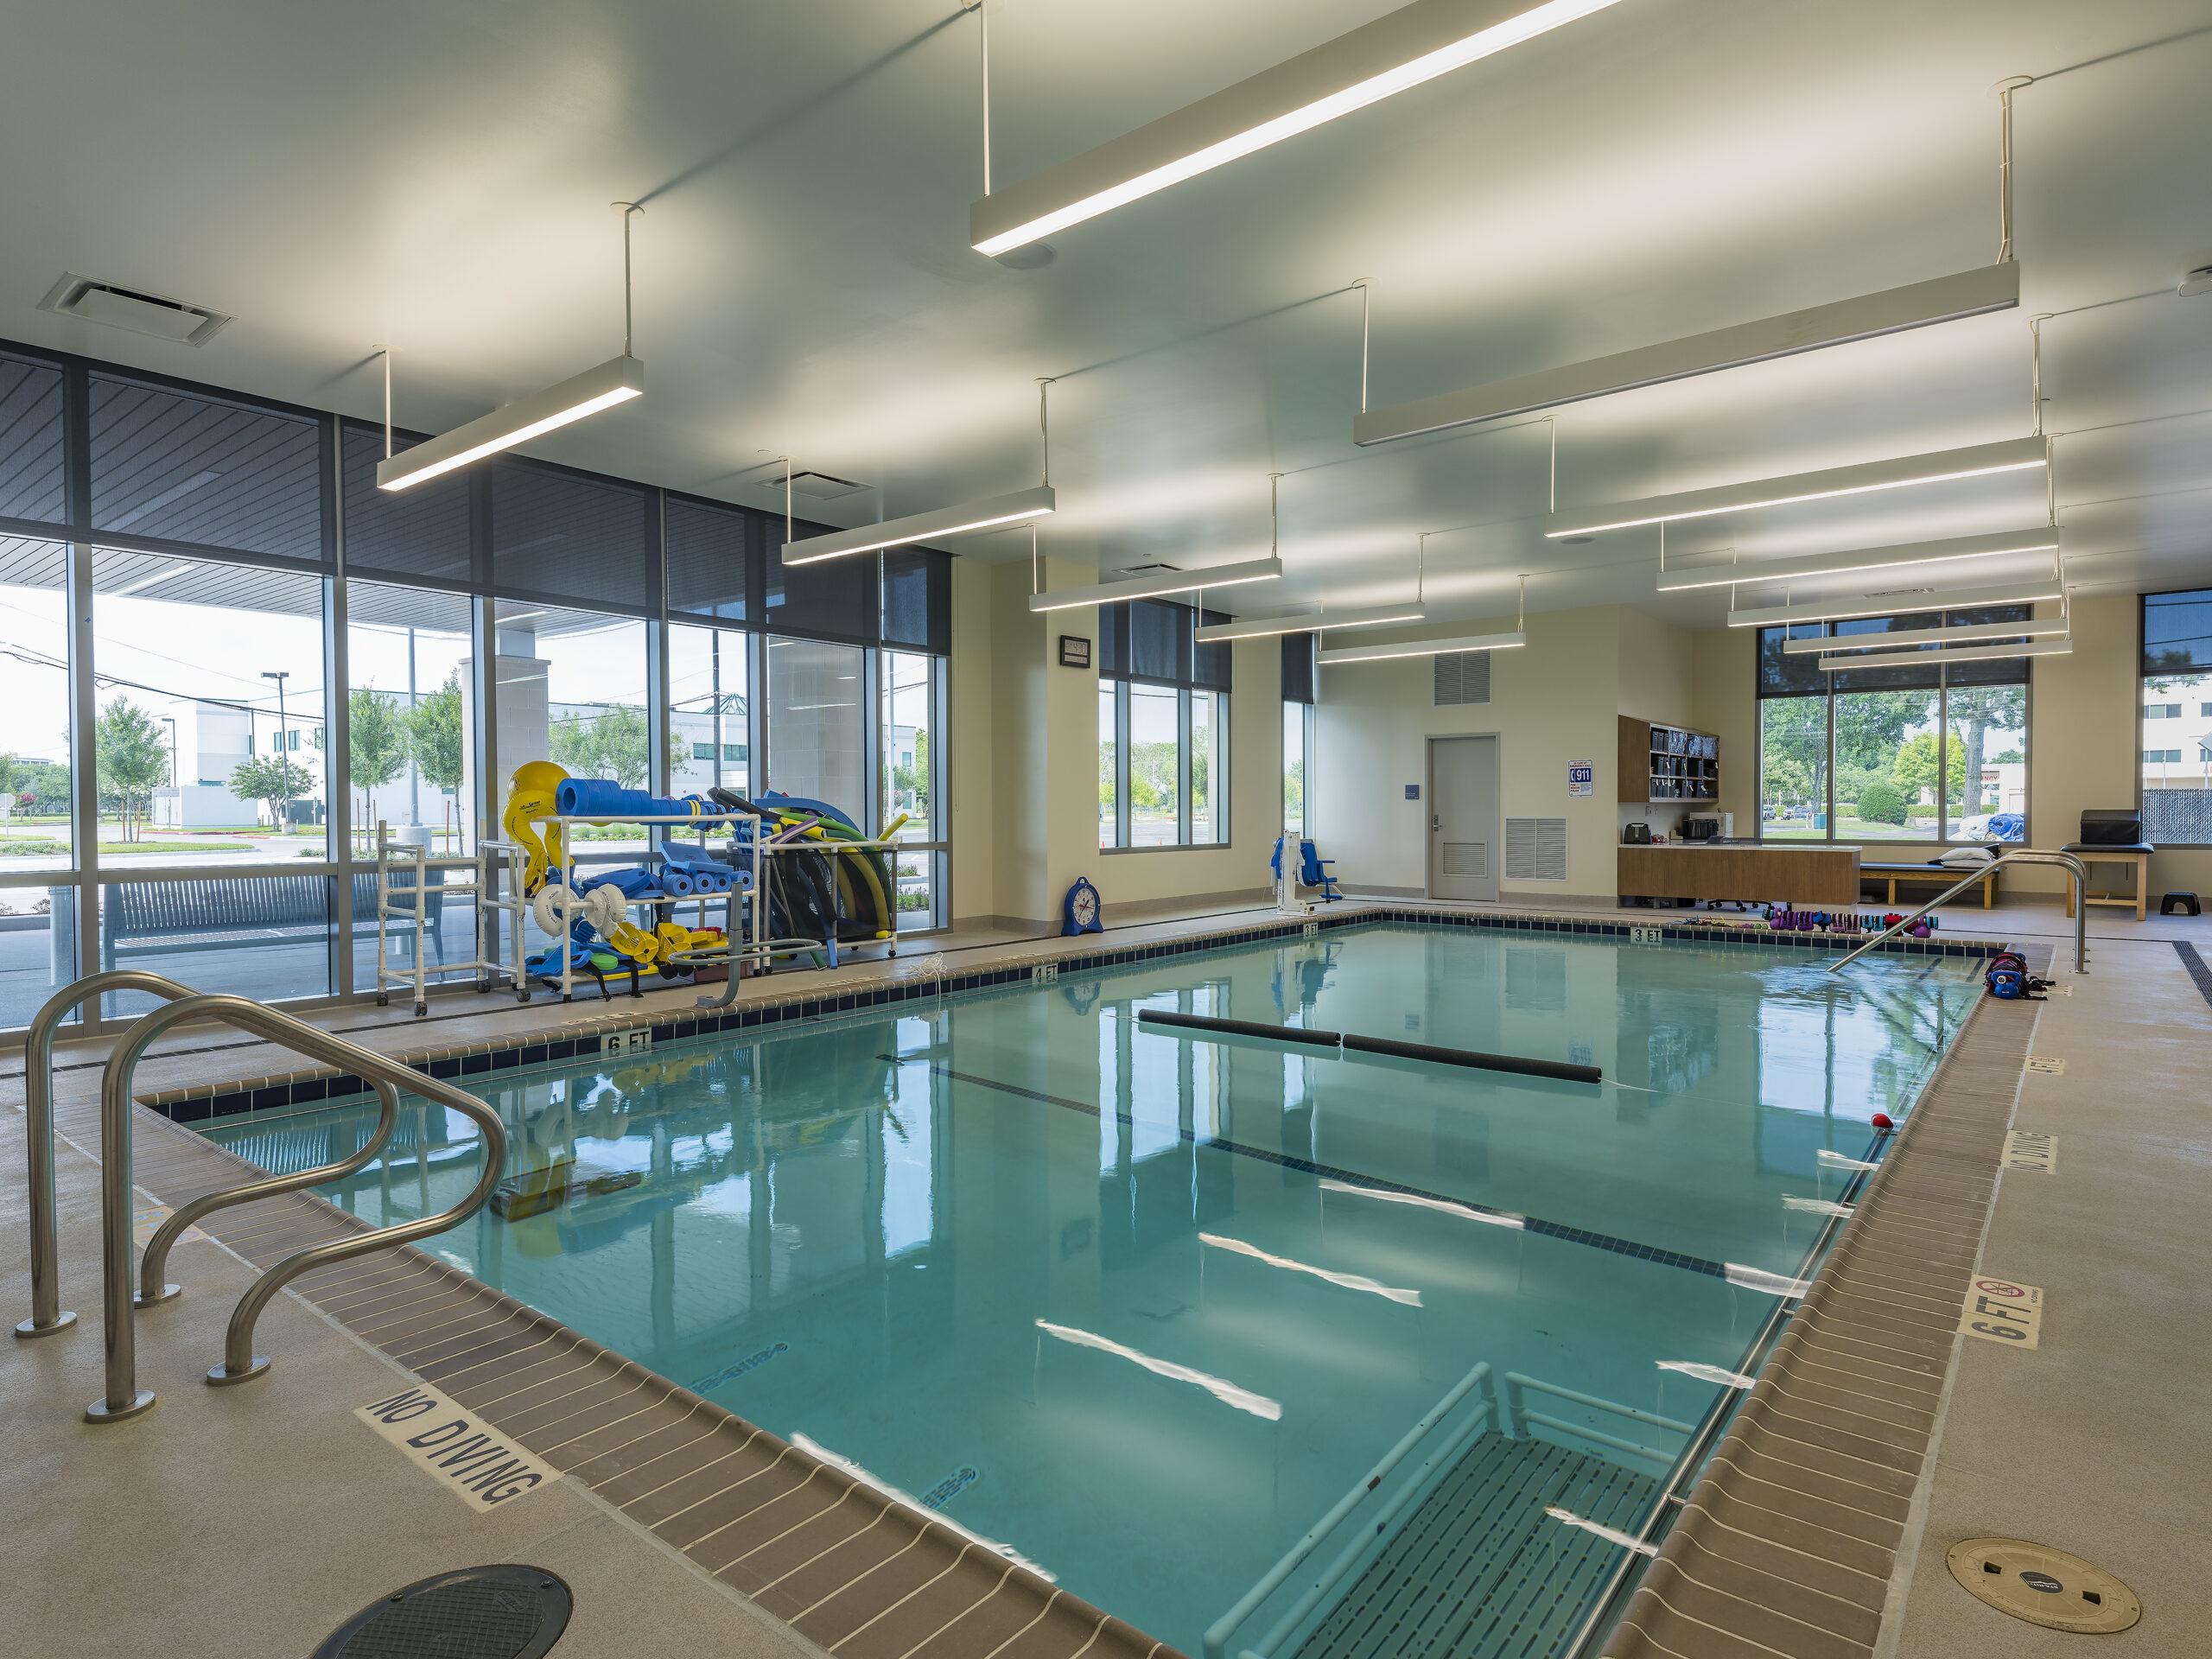 Houston Methodist Clear Lake Hospital - MOB 4 - Clear Lake, TX 061221